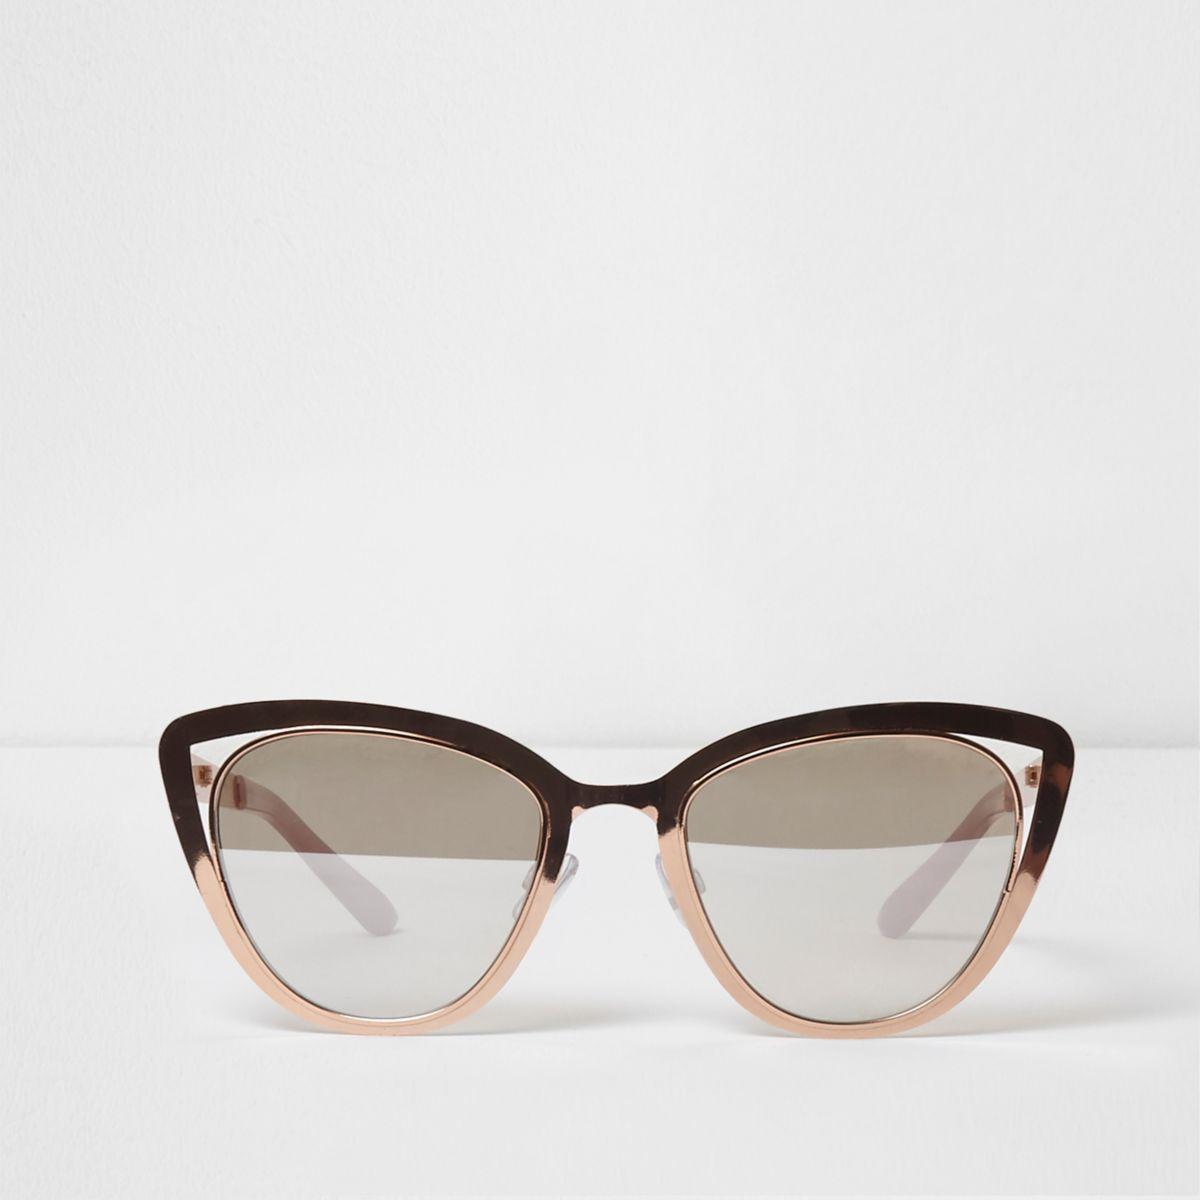 Rose gold tone cat eye cut out sunglasses